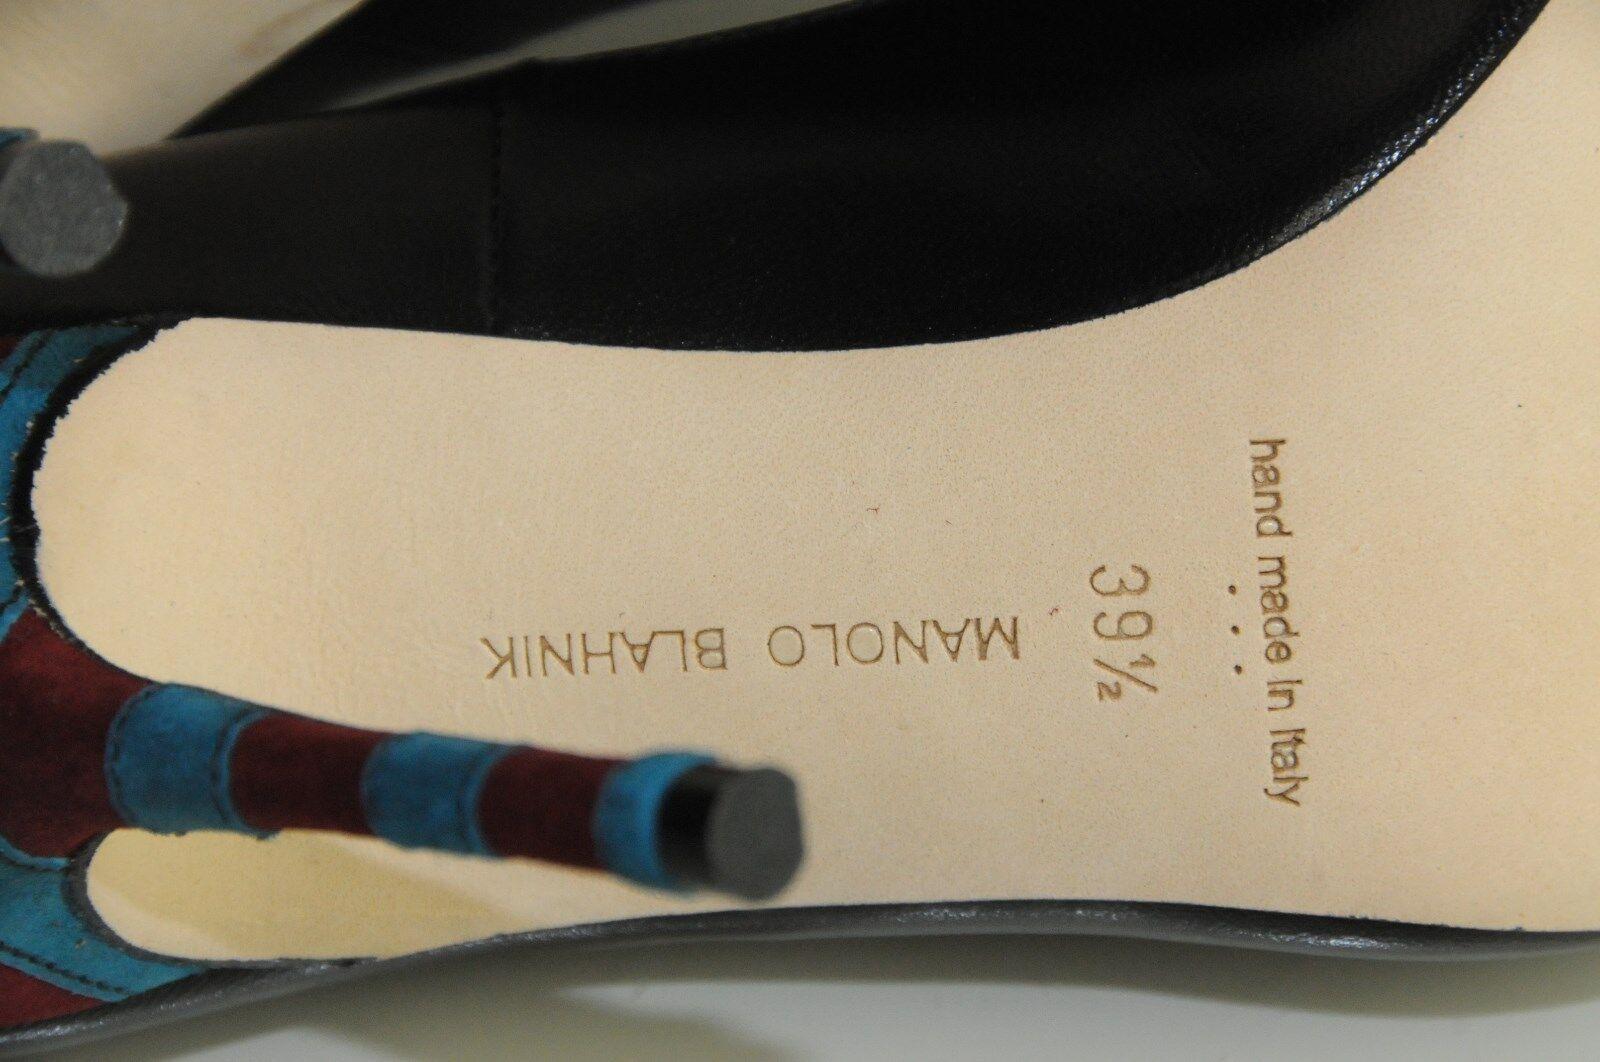 Neuf Manolo Blahnik Timbro Bb Talon Noir Noir Noir 105 Bordeaux Bleu Canard 1e73ca